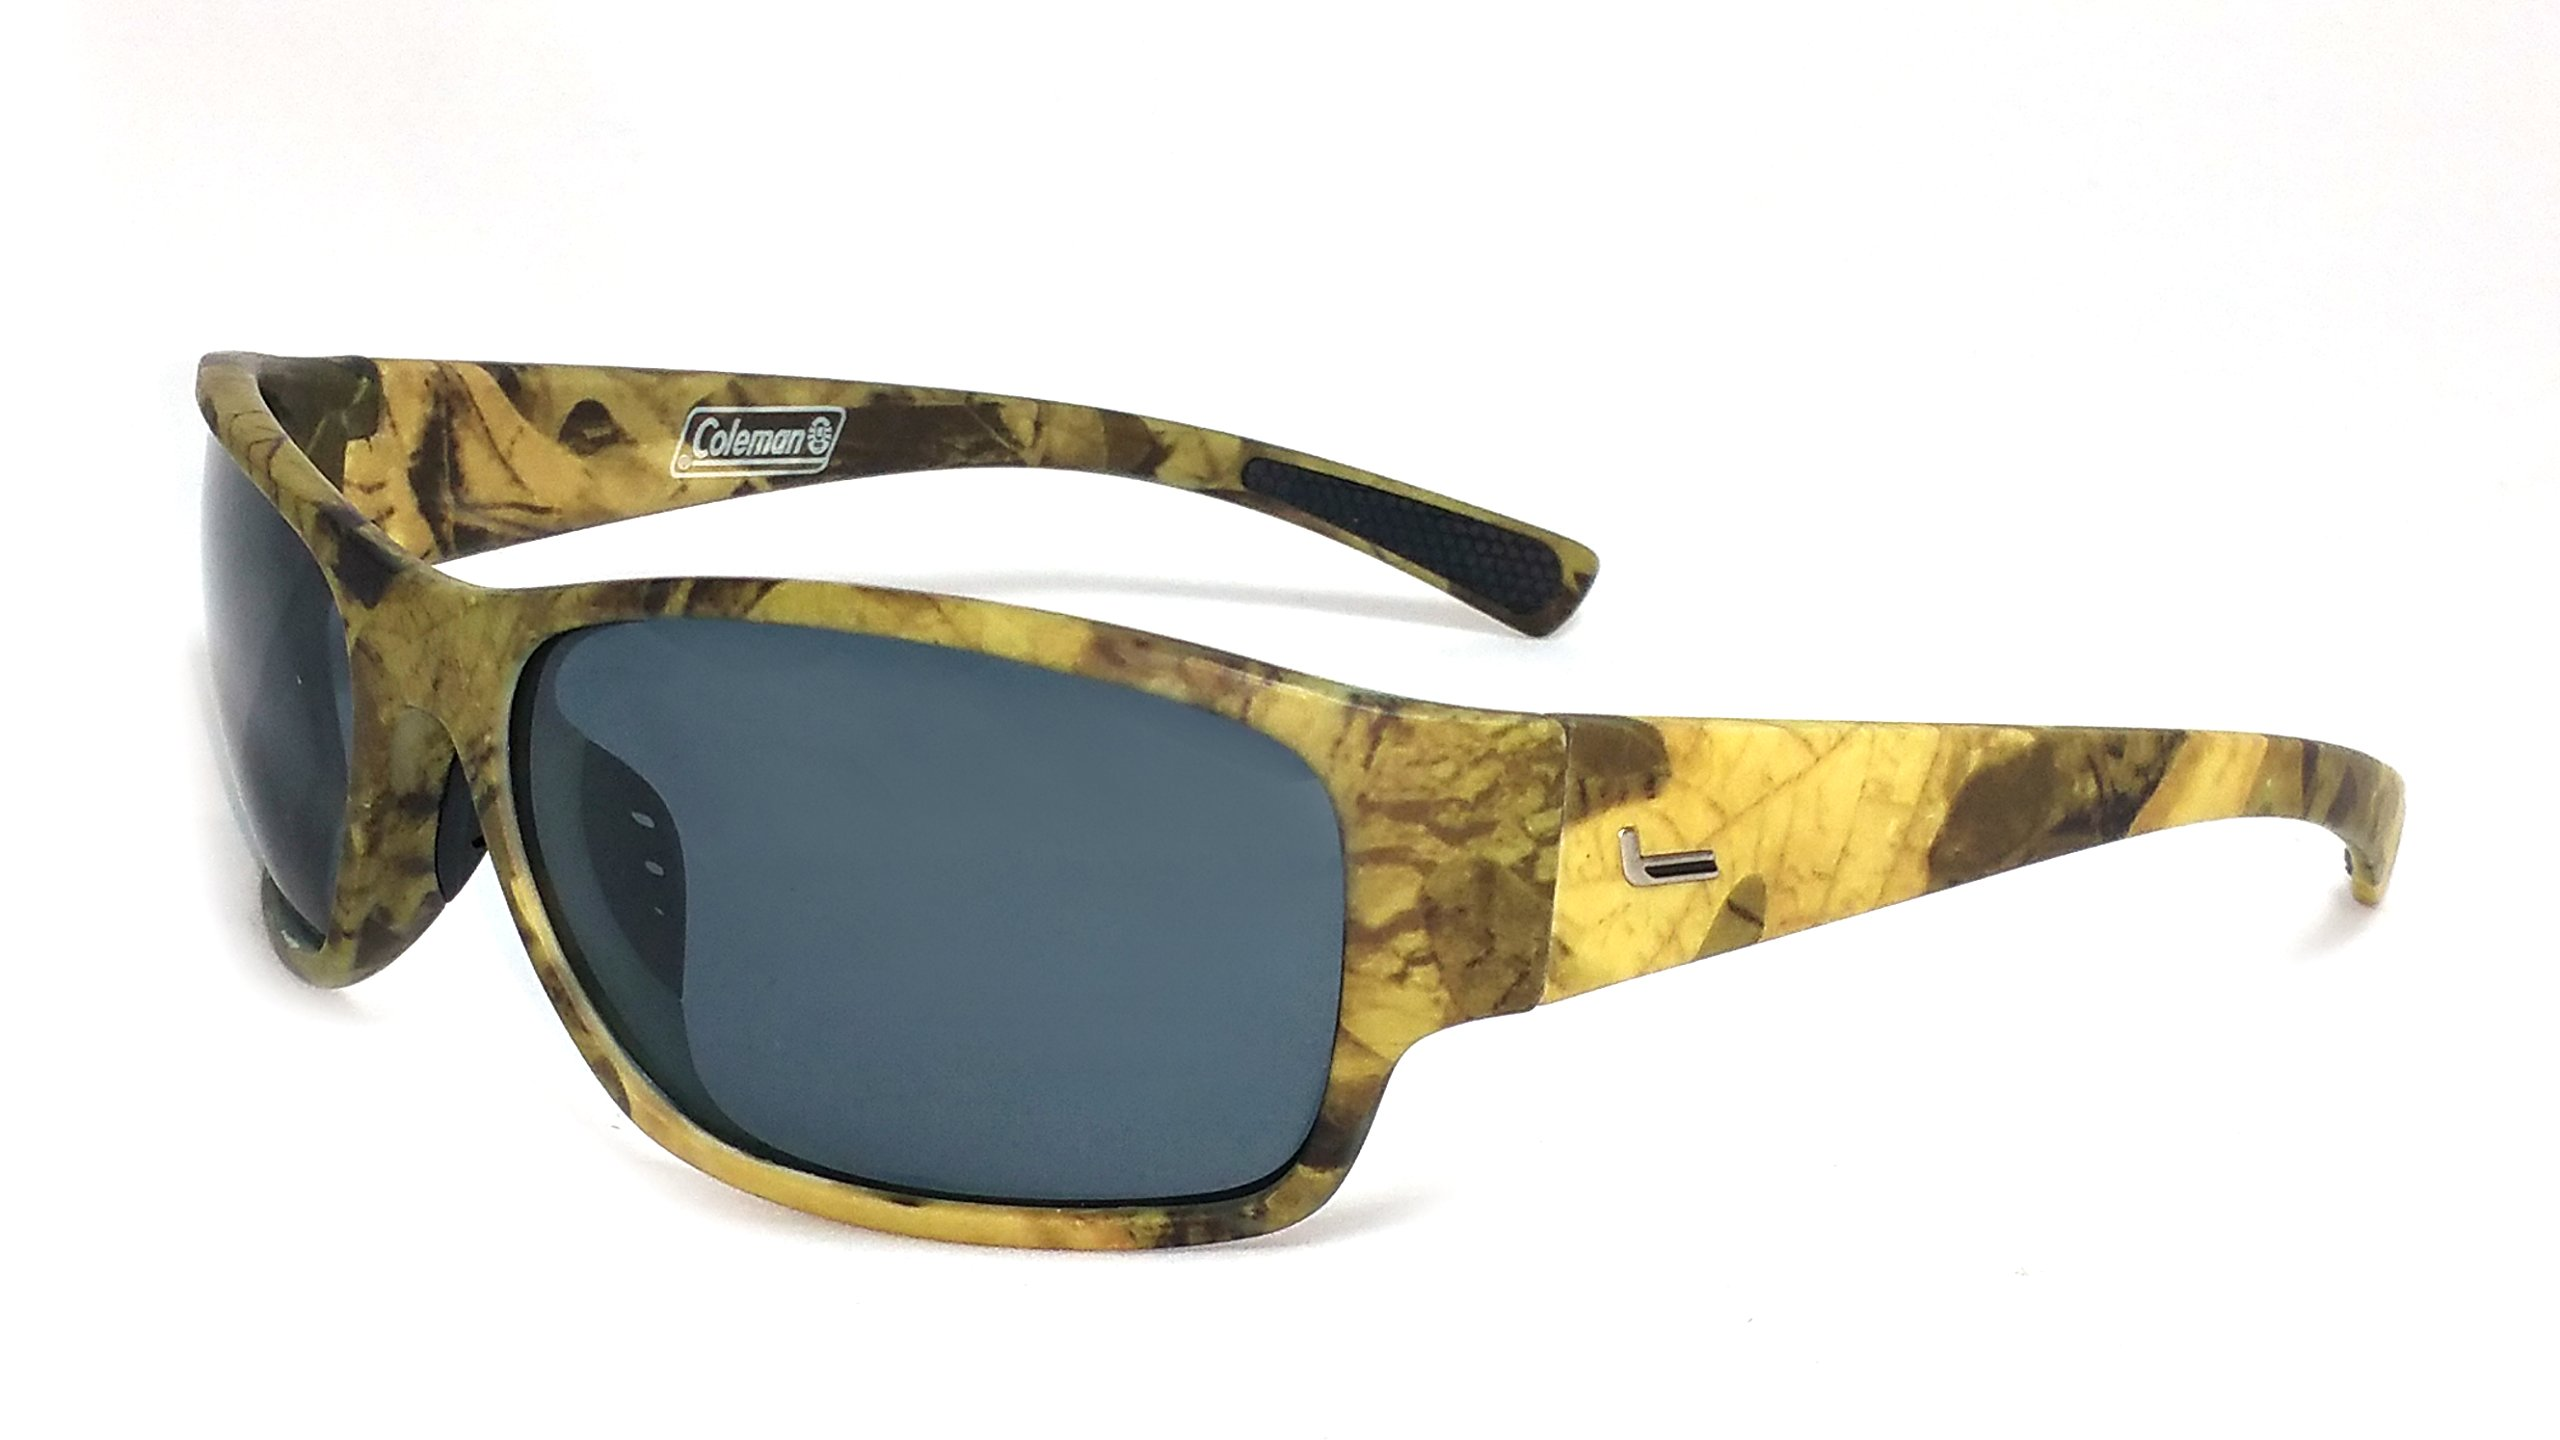 Coleman Predator Camouflage Polarized Rectangular Sunglasses, Bronze, 65 mm by Coleman